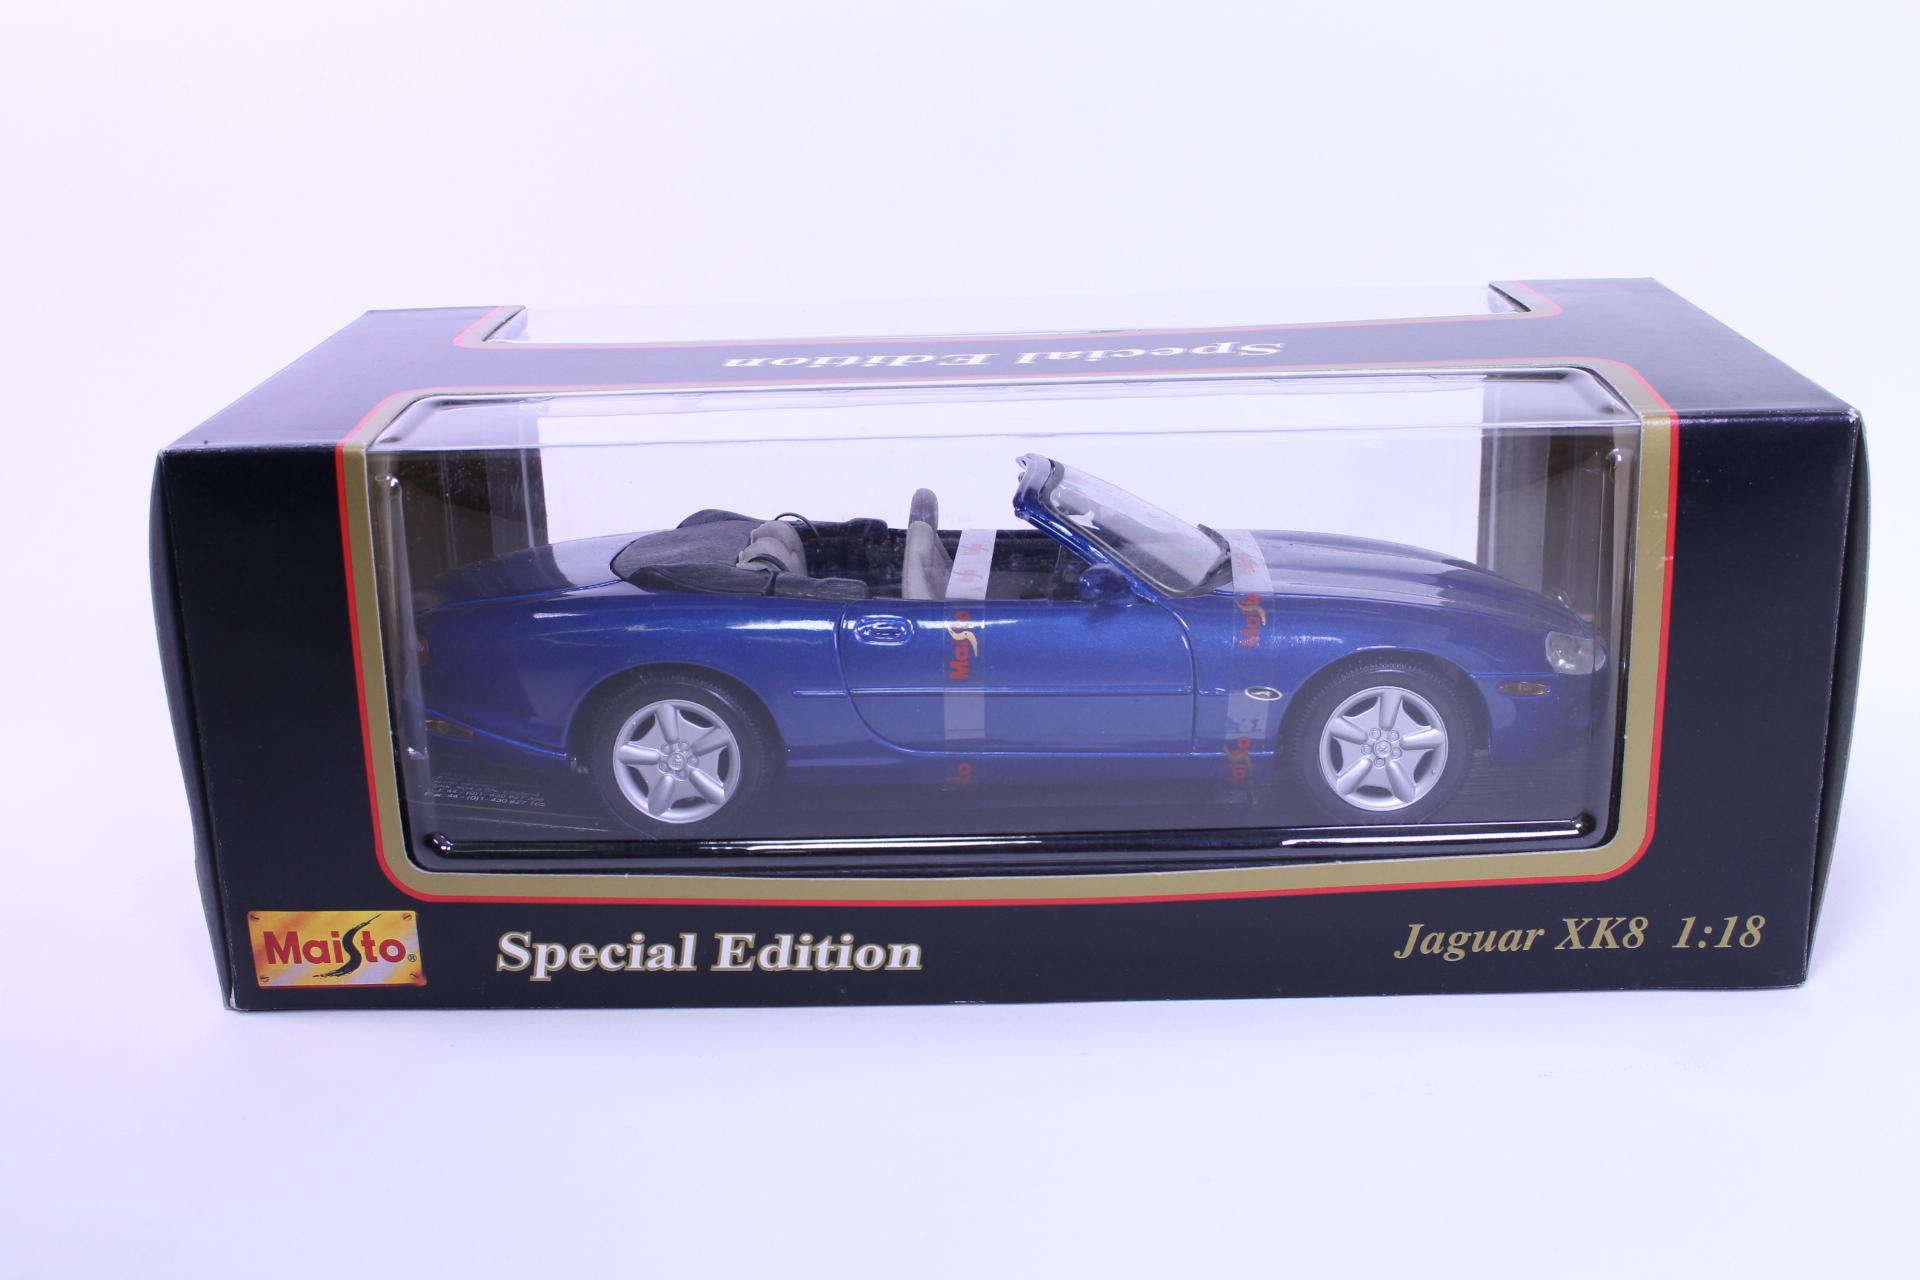 Picture Gallery for Maisto 31836 1996 Jaguar XK8